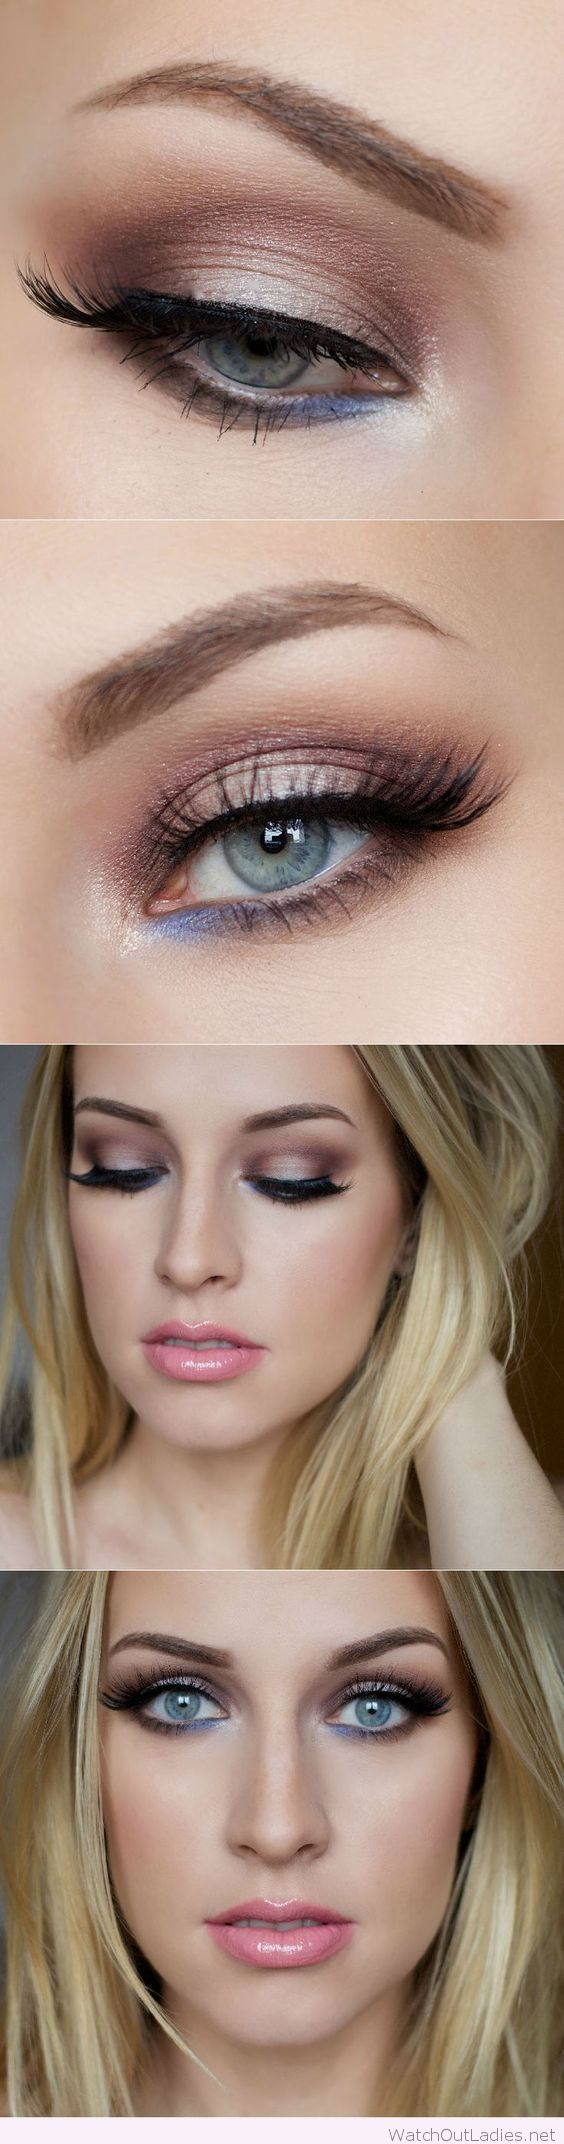 Para ojos azules resáltalos con un toque morado.  #Sombras #Ojos #Novias